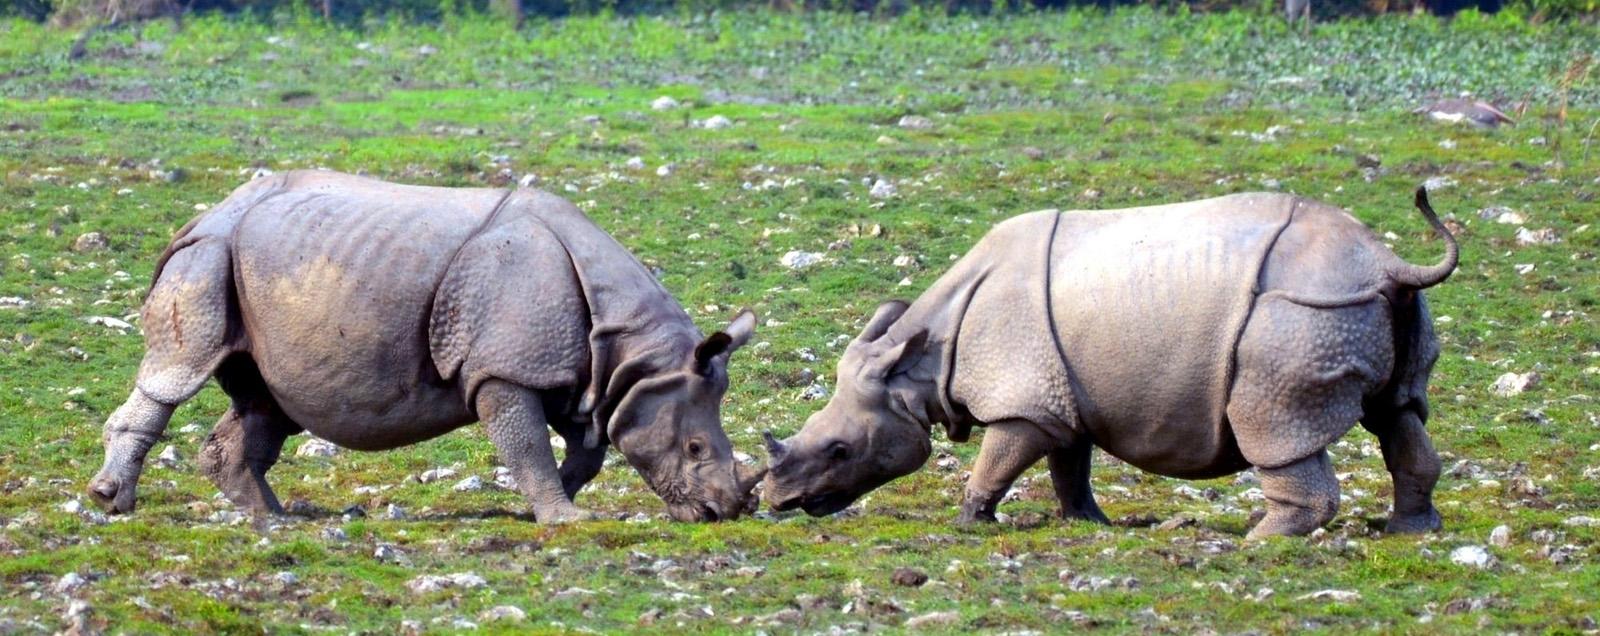 Dudhwa National Park Rhino